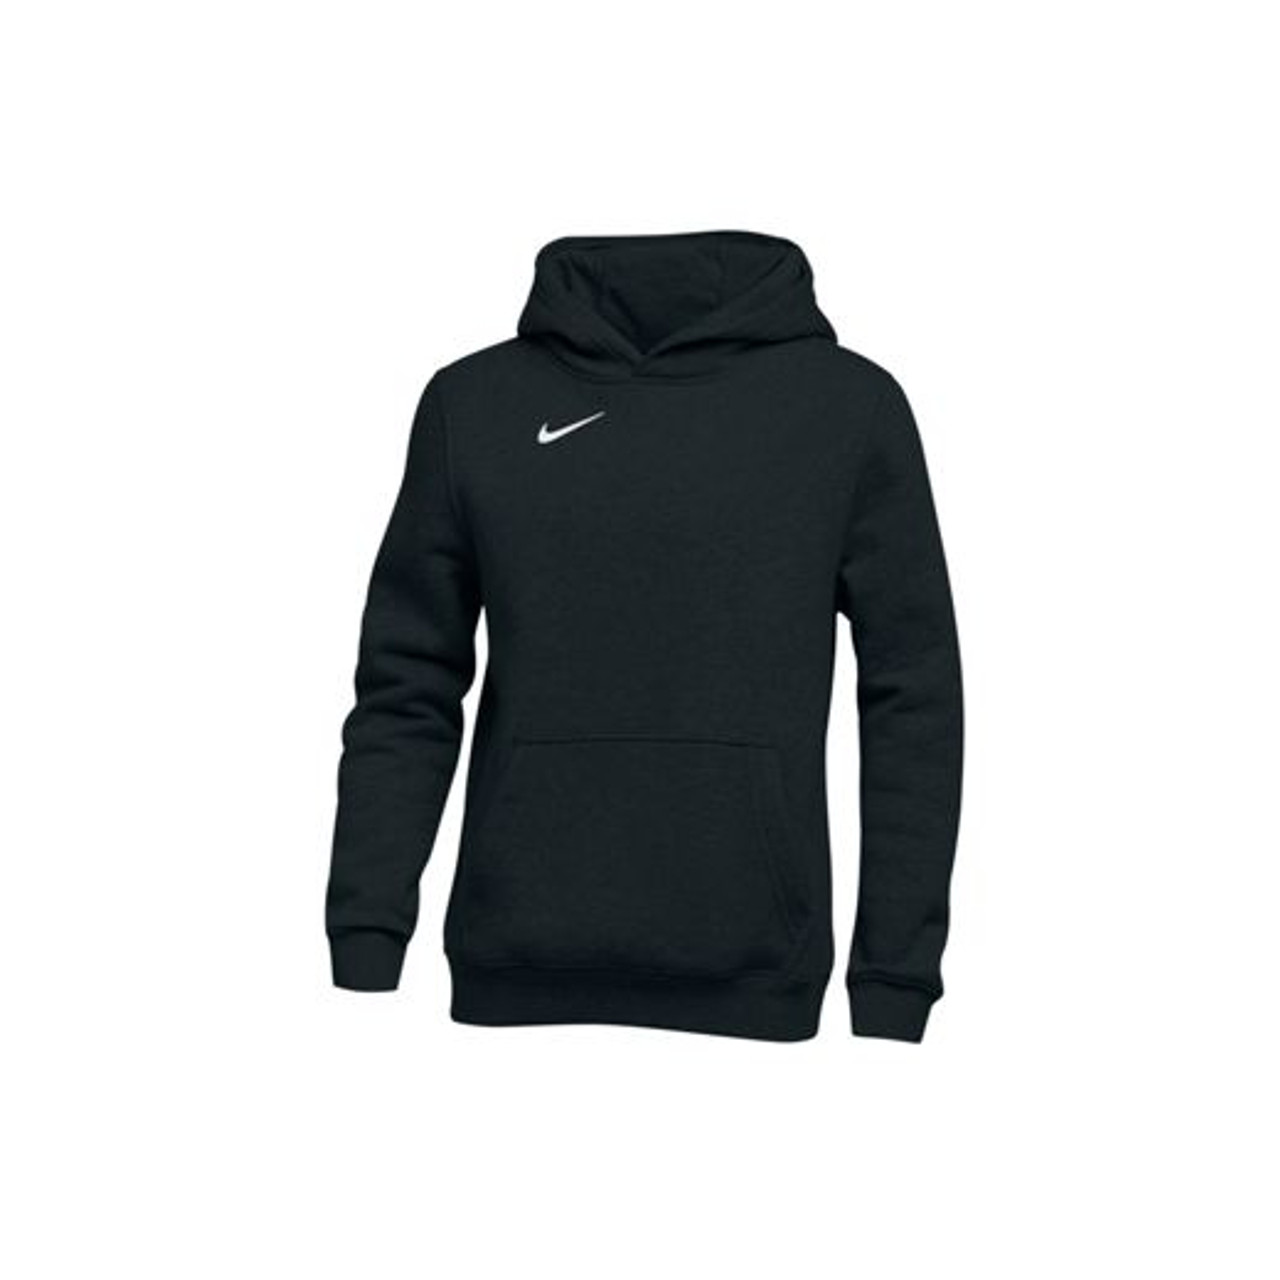 Nike Youth Club Fleece Pullover Hoodie